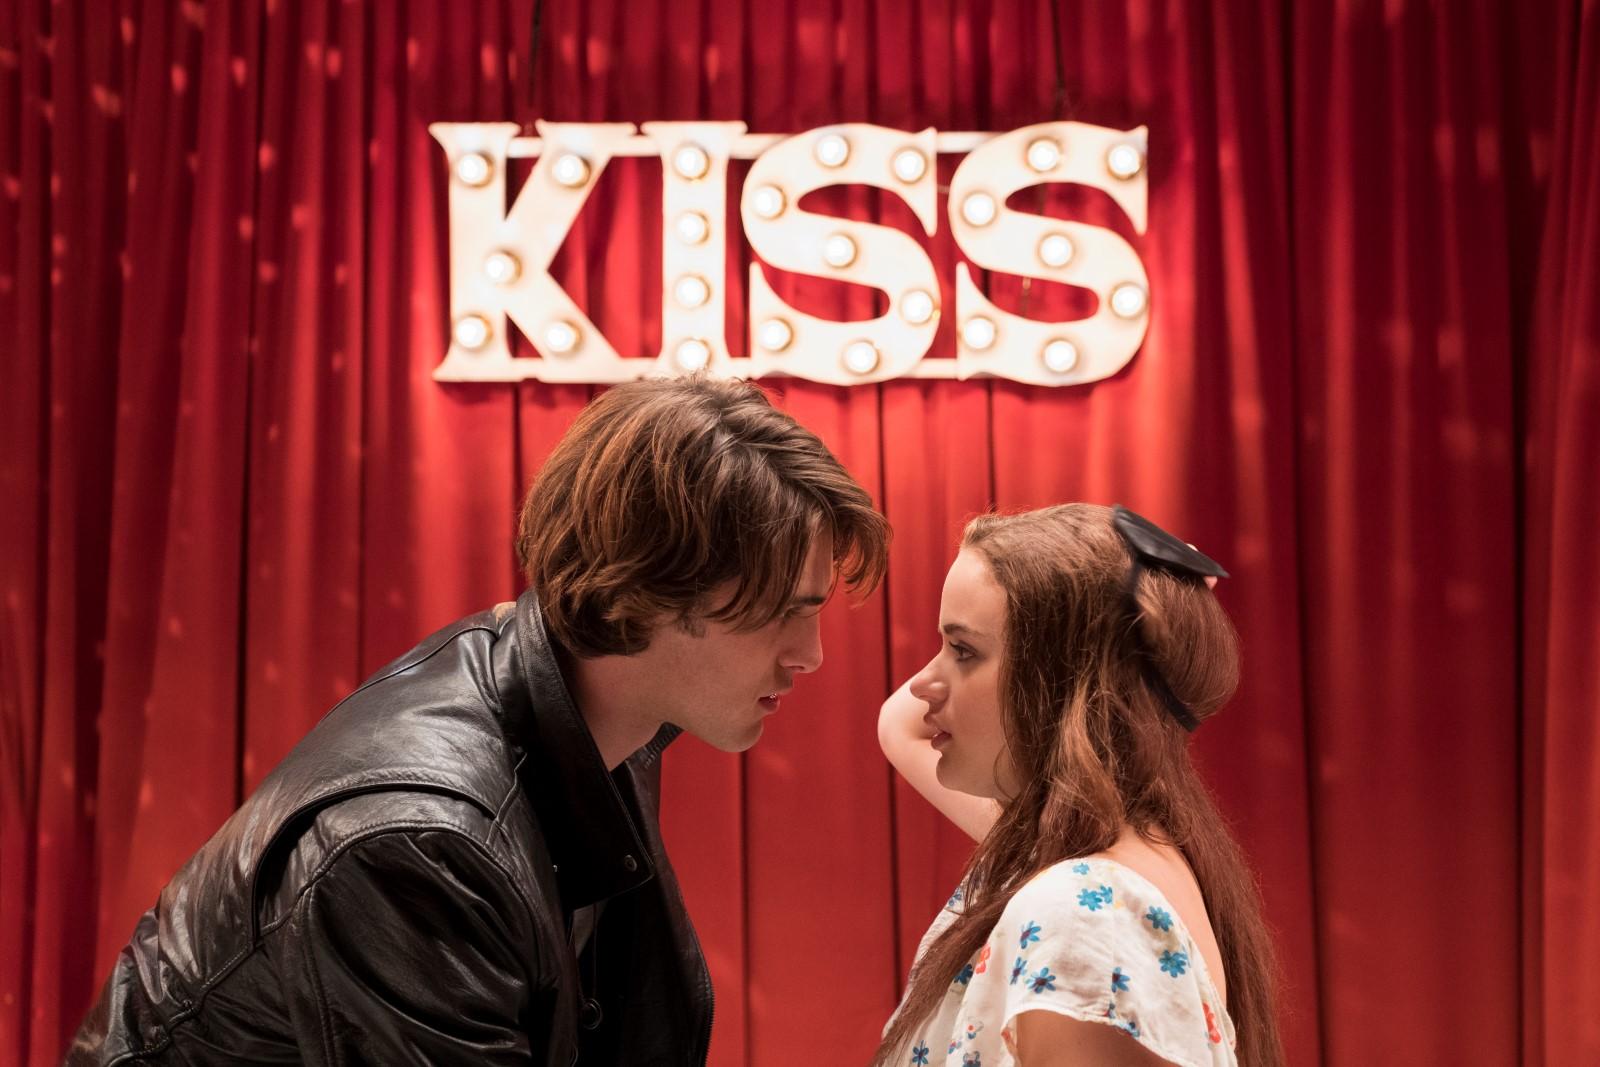 the kissing booth ile ilgili görsel sonucu